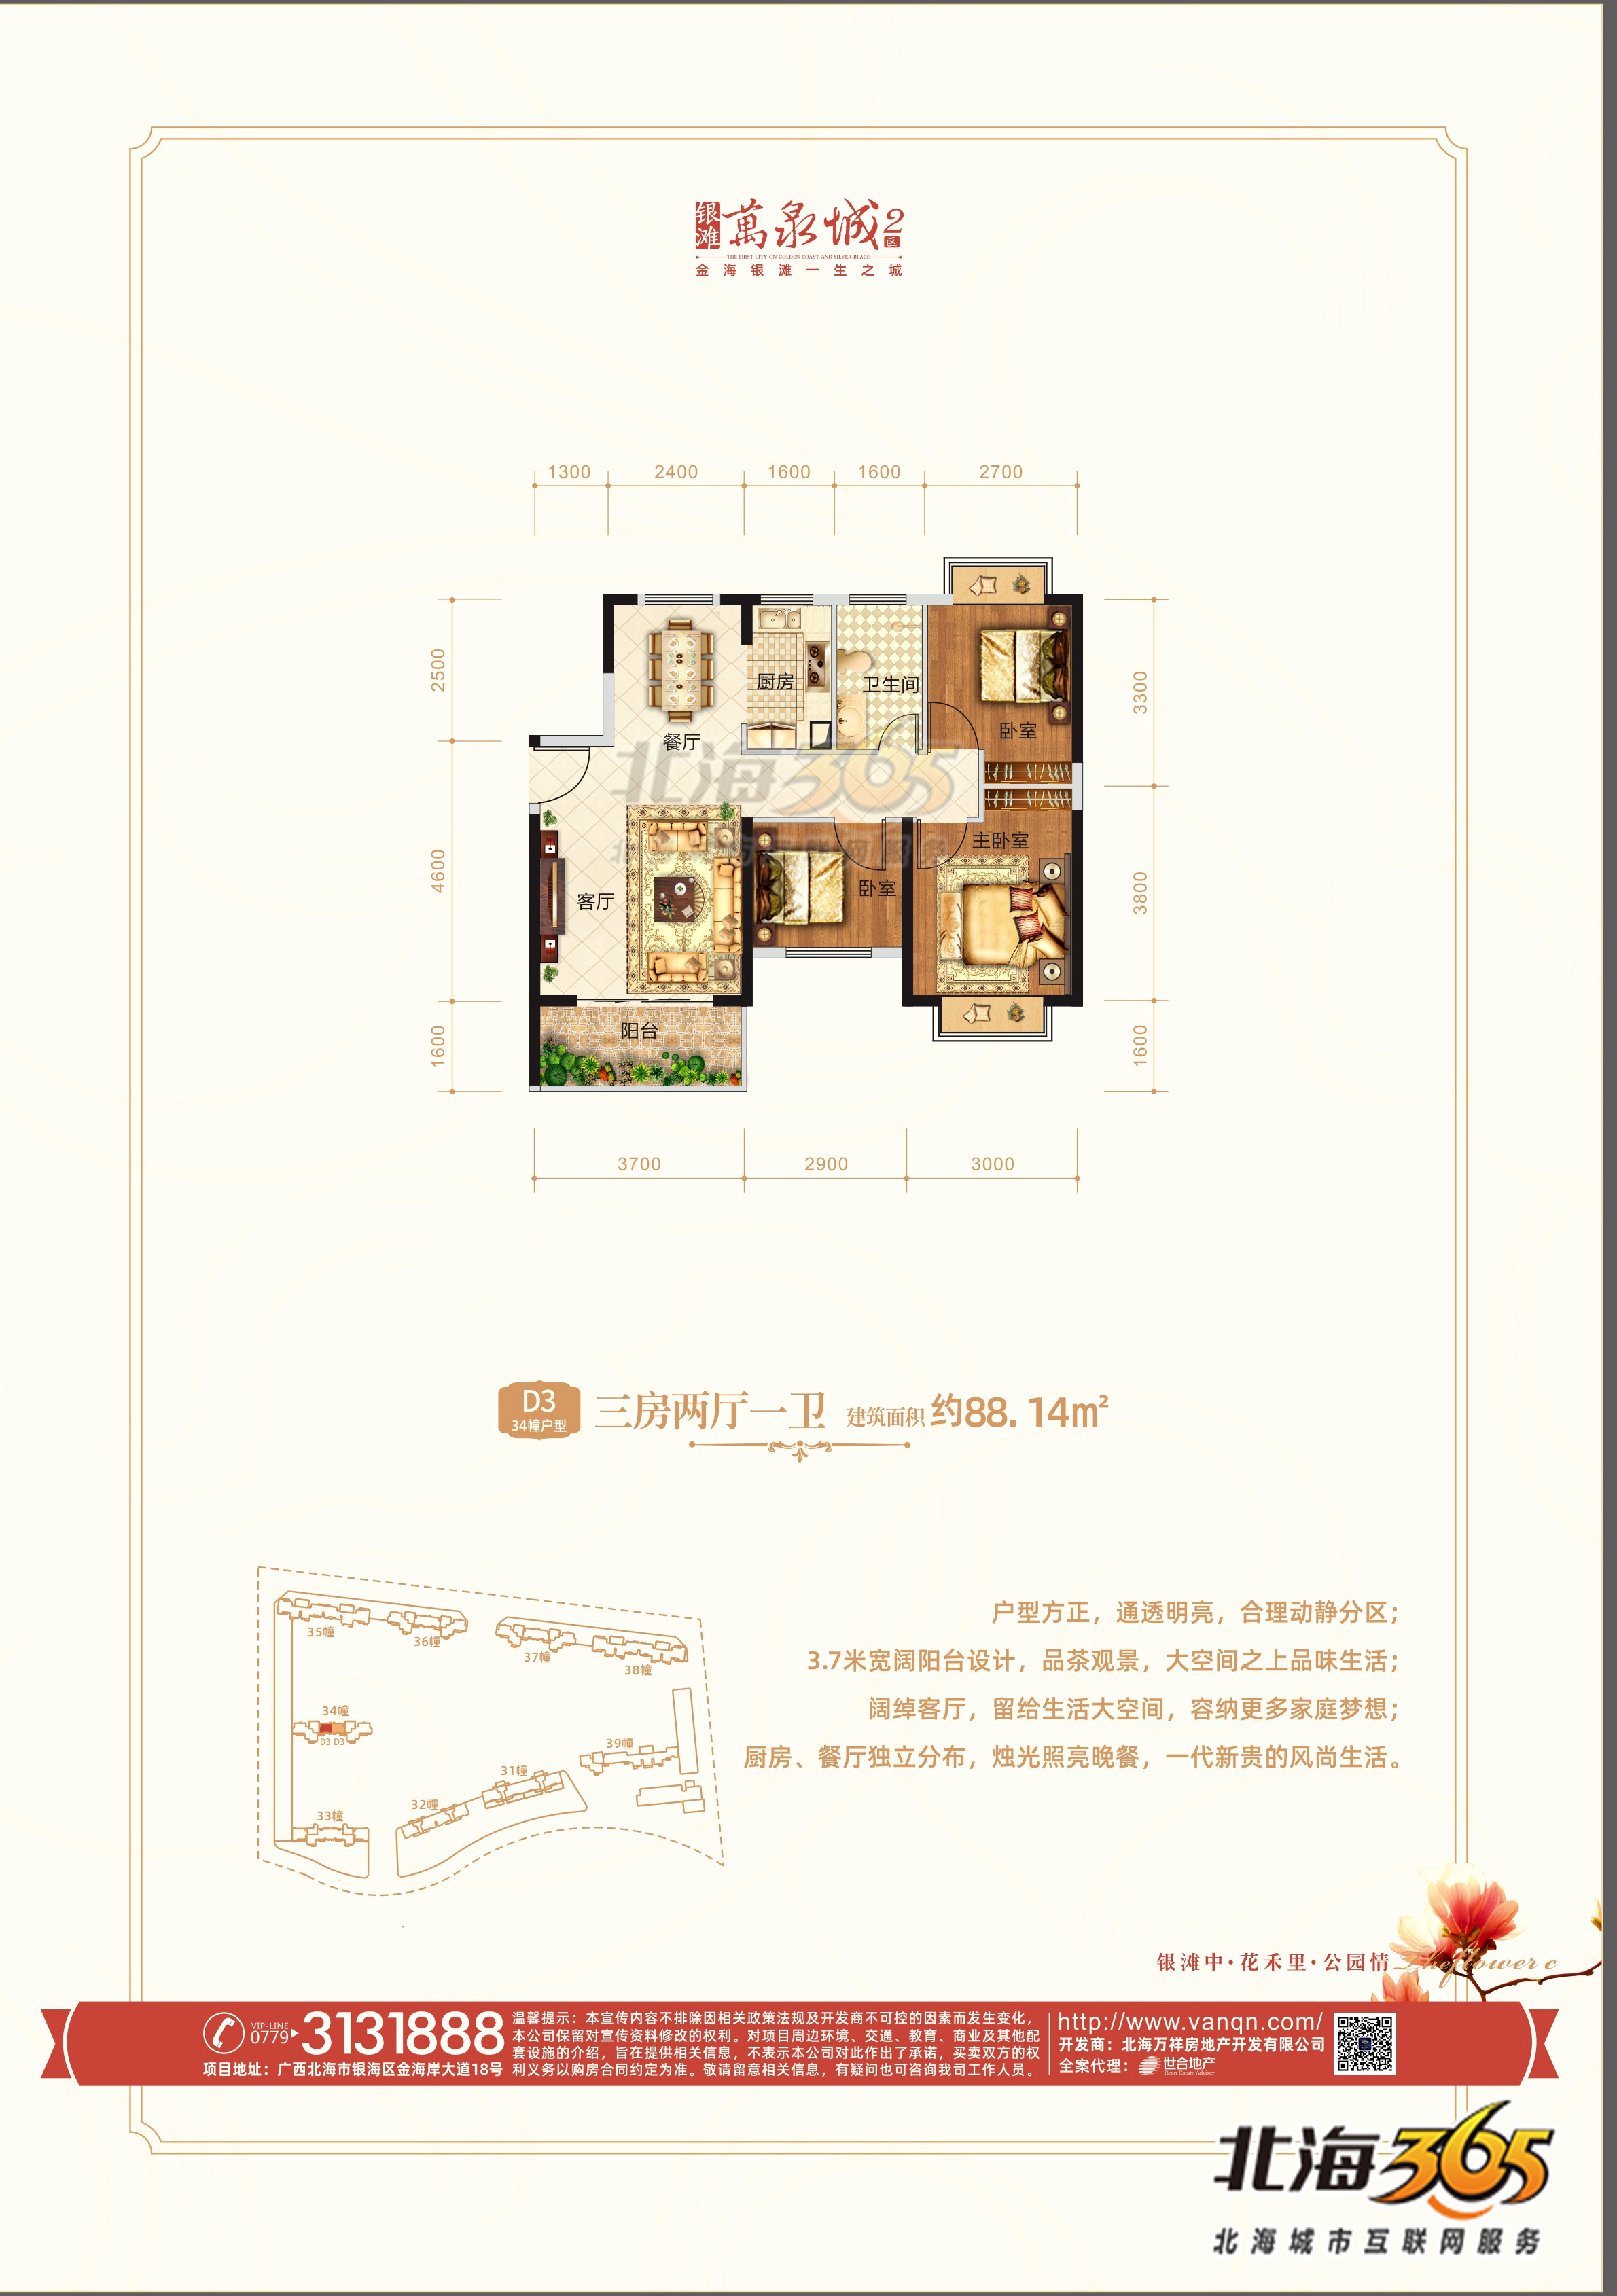 D3-34幢户型三房两厅一卫